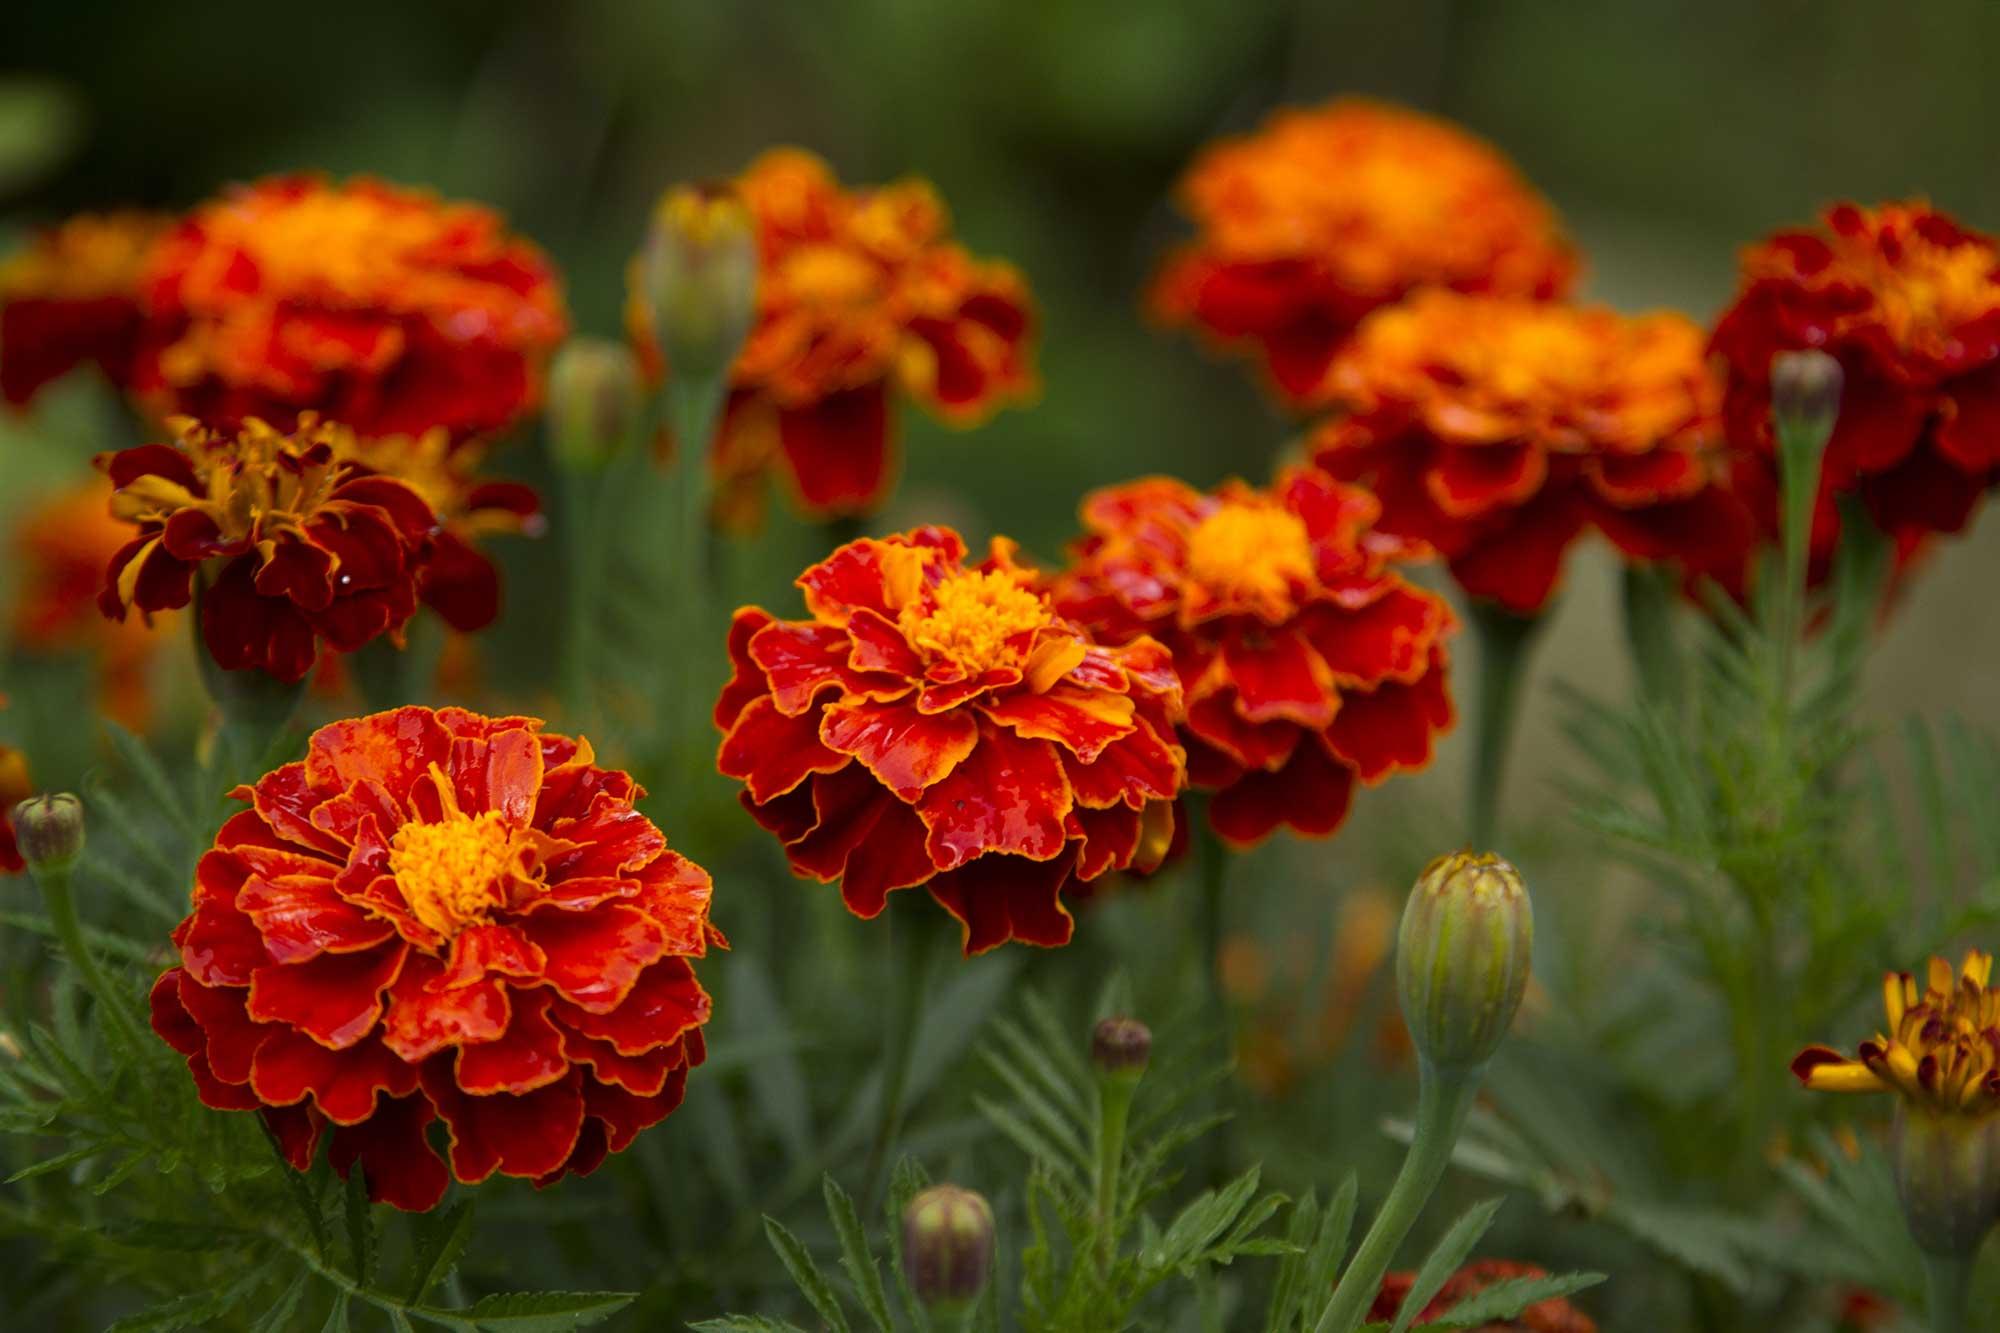 Tagetes (Marigold)